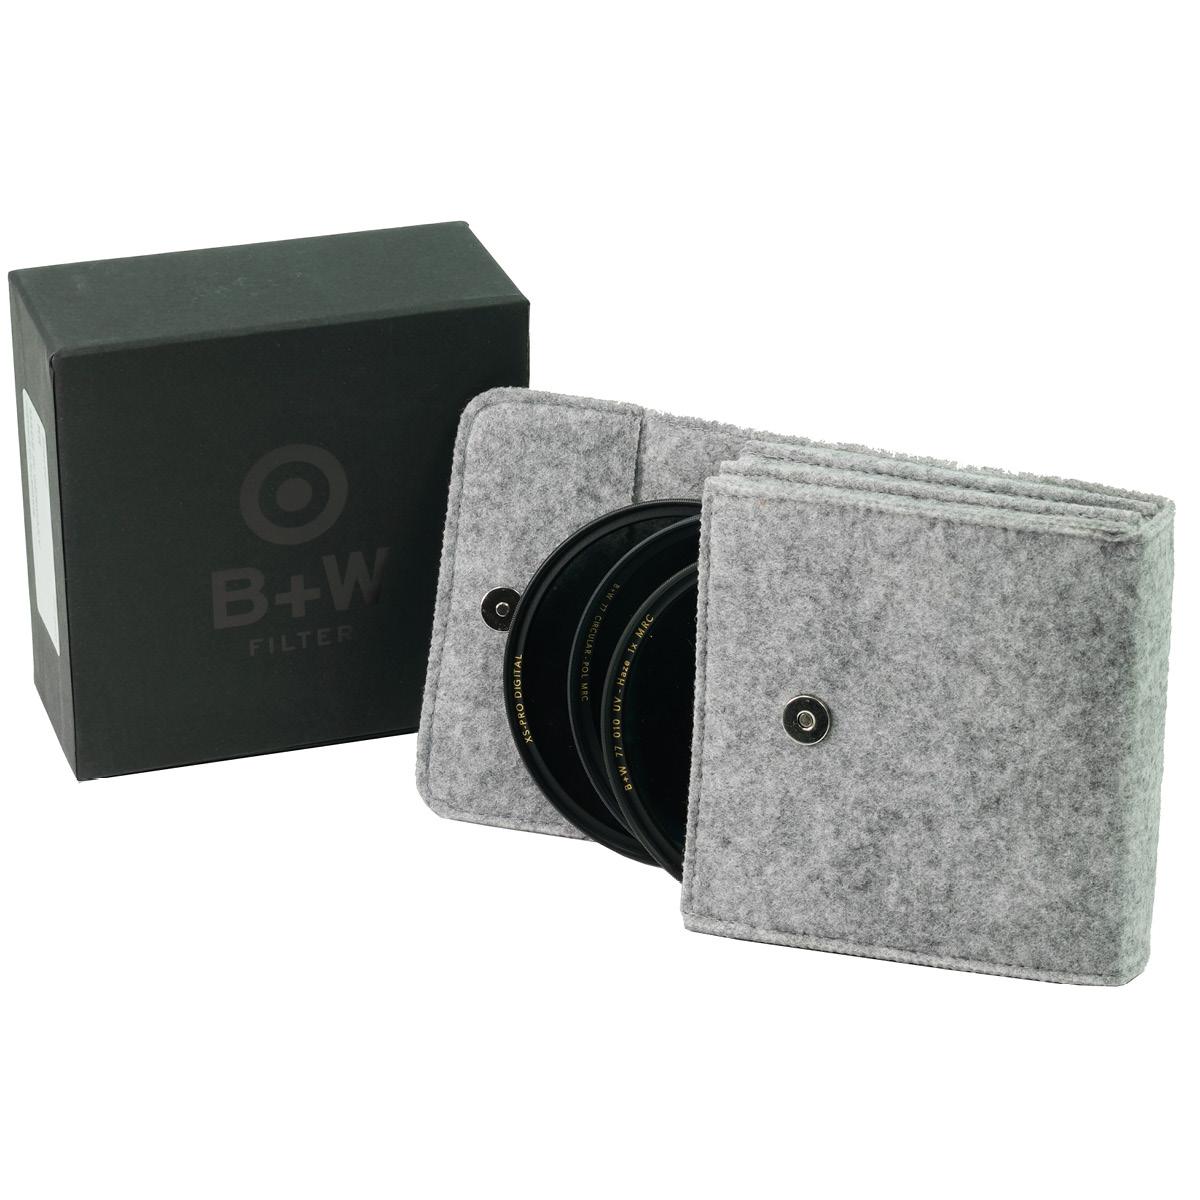 B+W Creative Starter Kit 46 mm